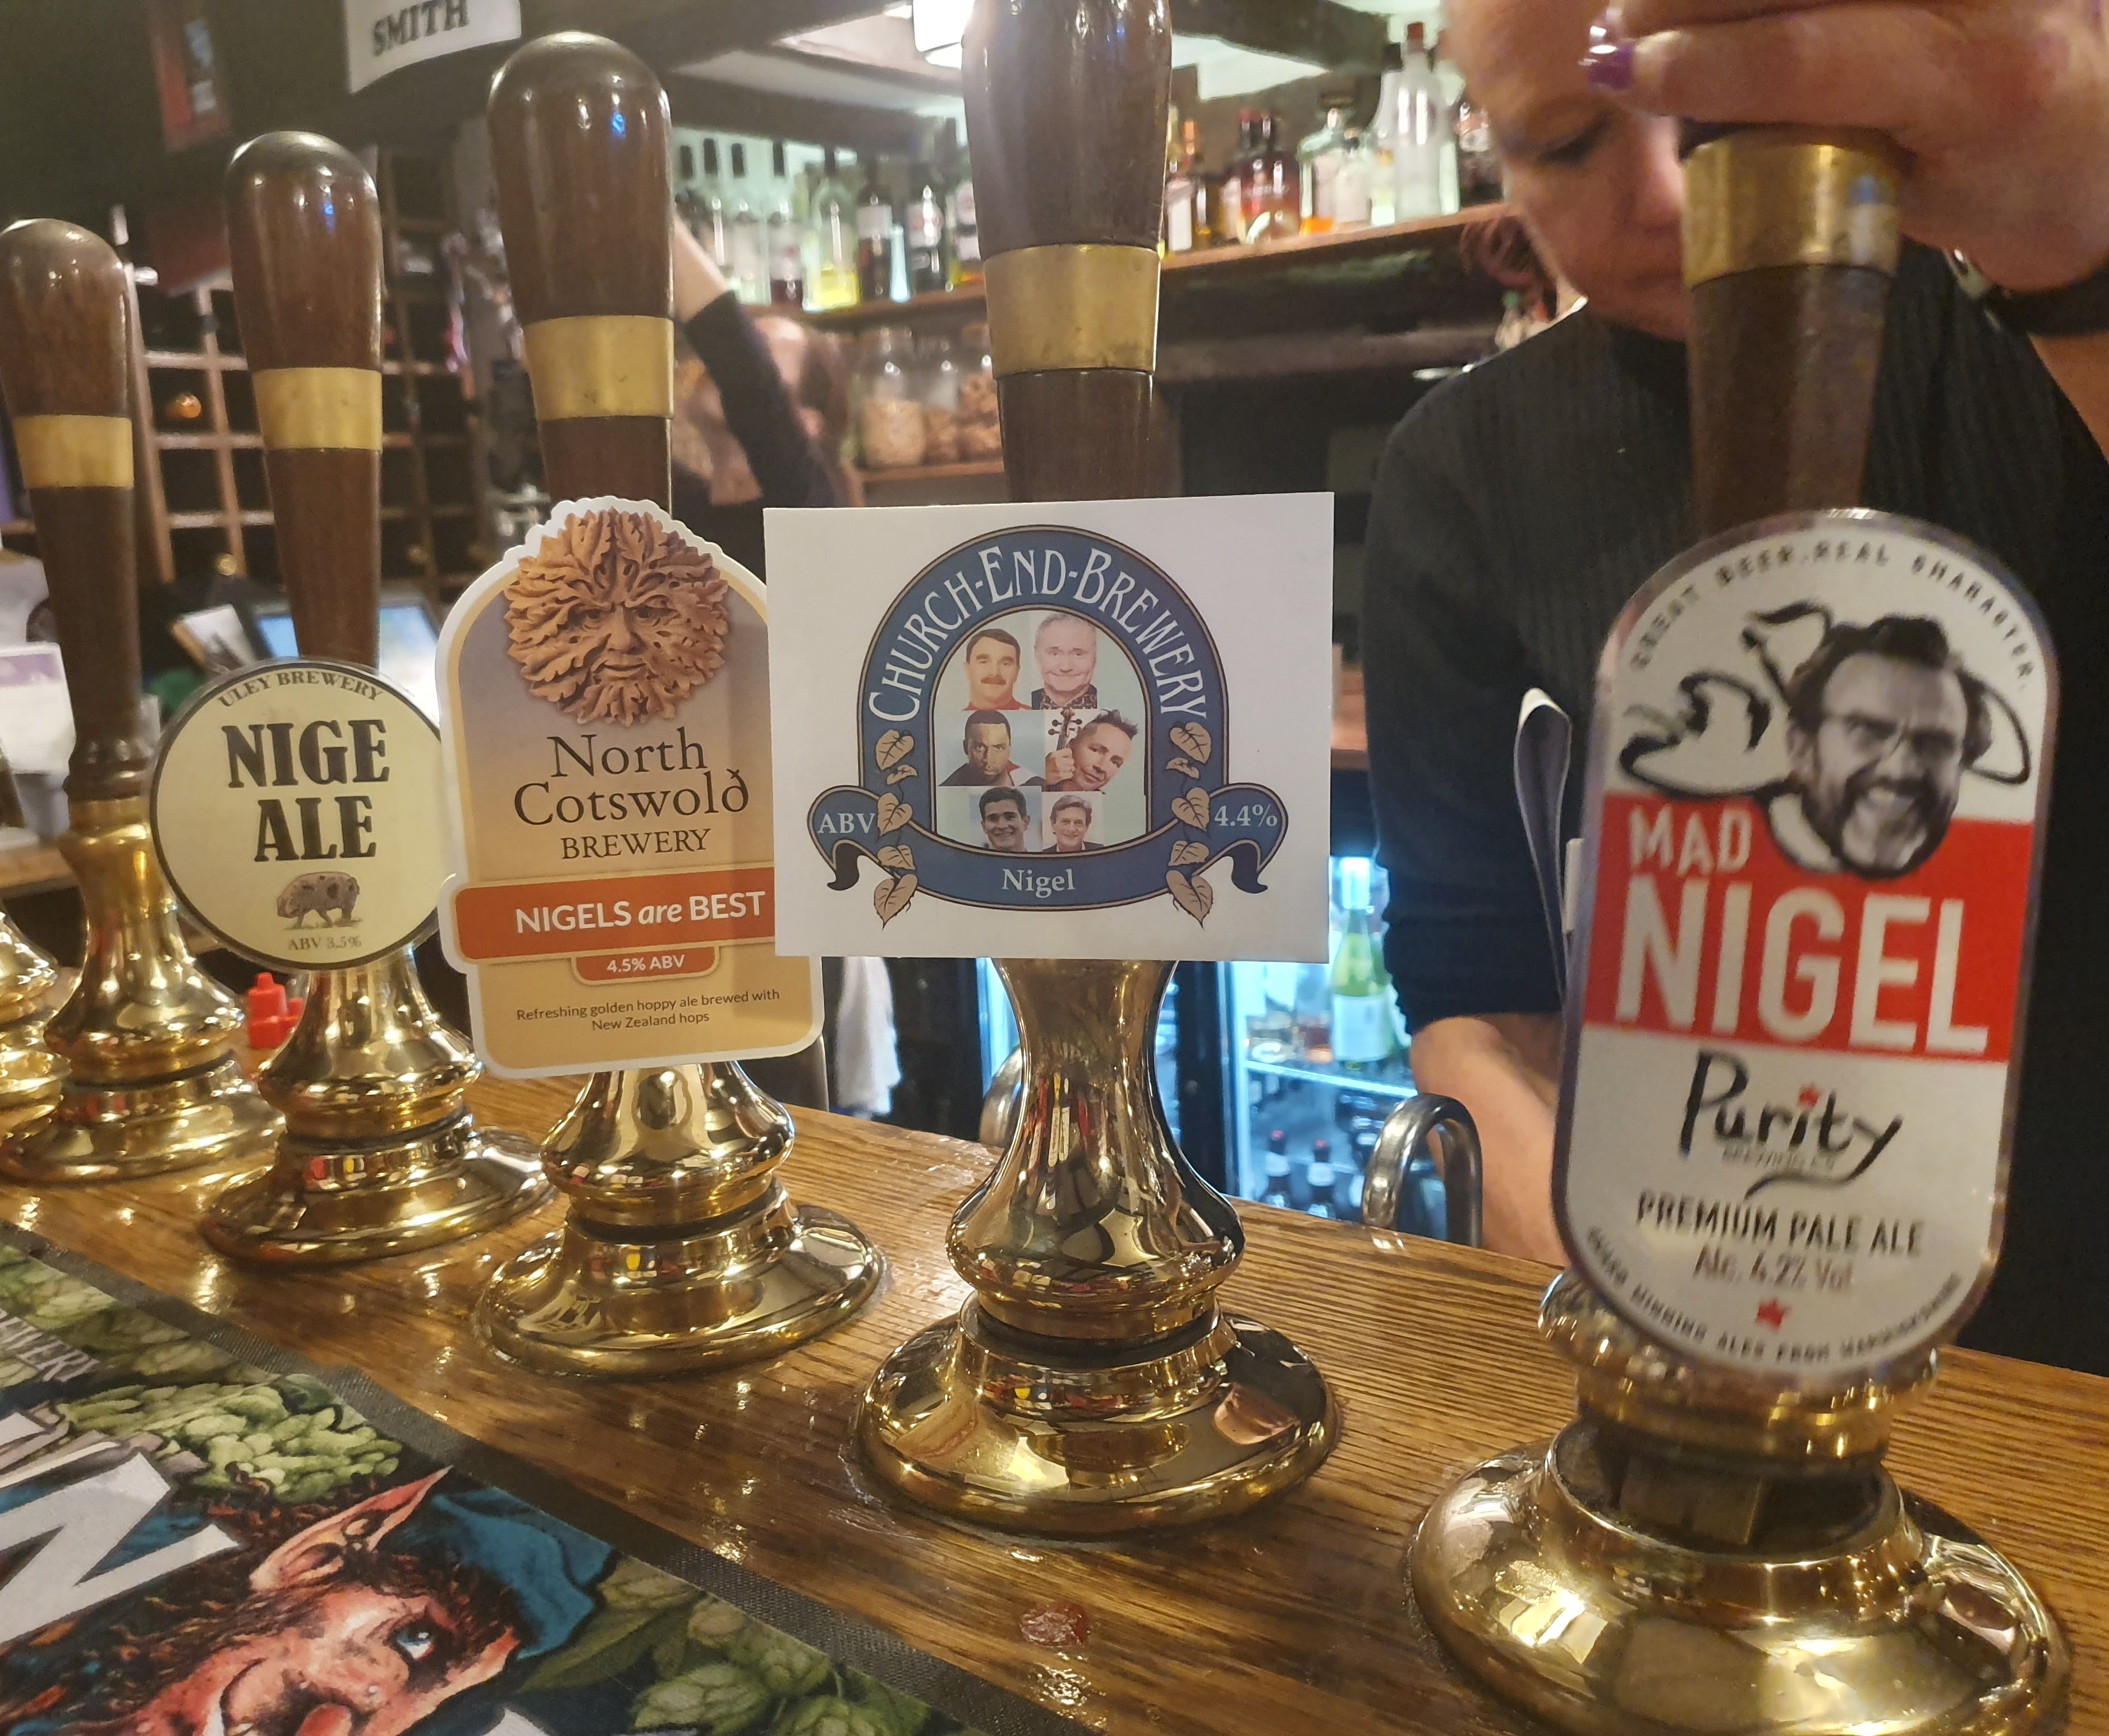 Nigel-themed beers at the Fleece Inn